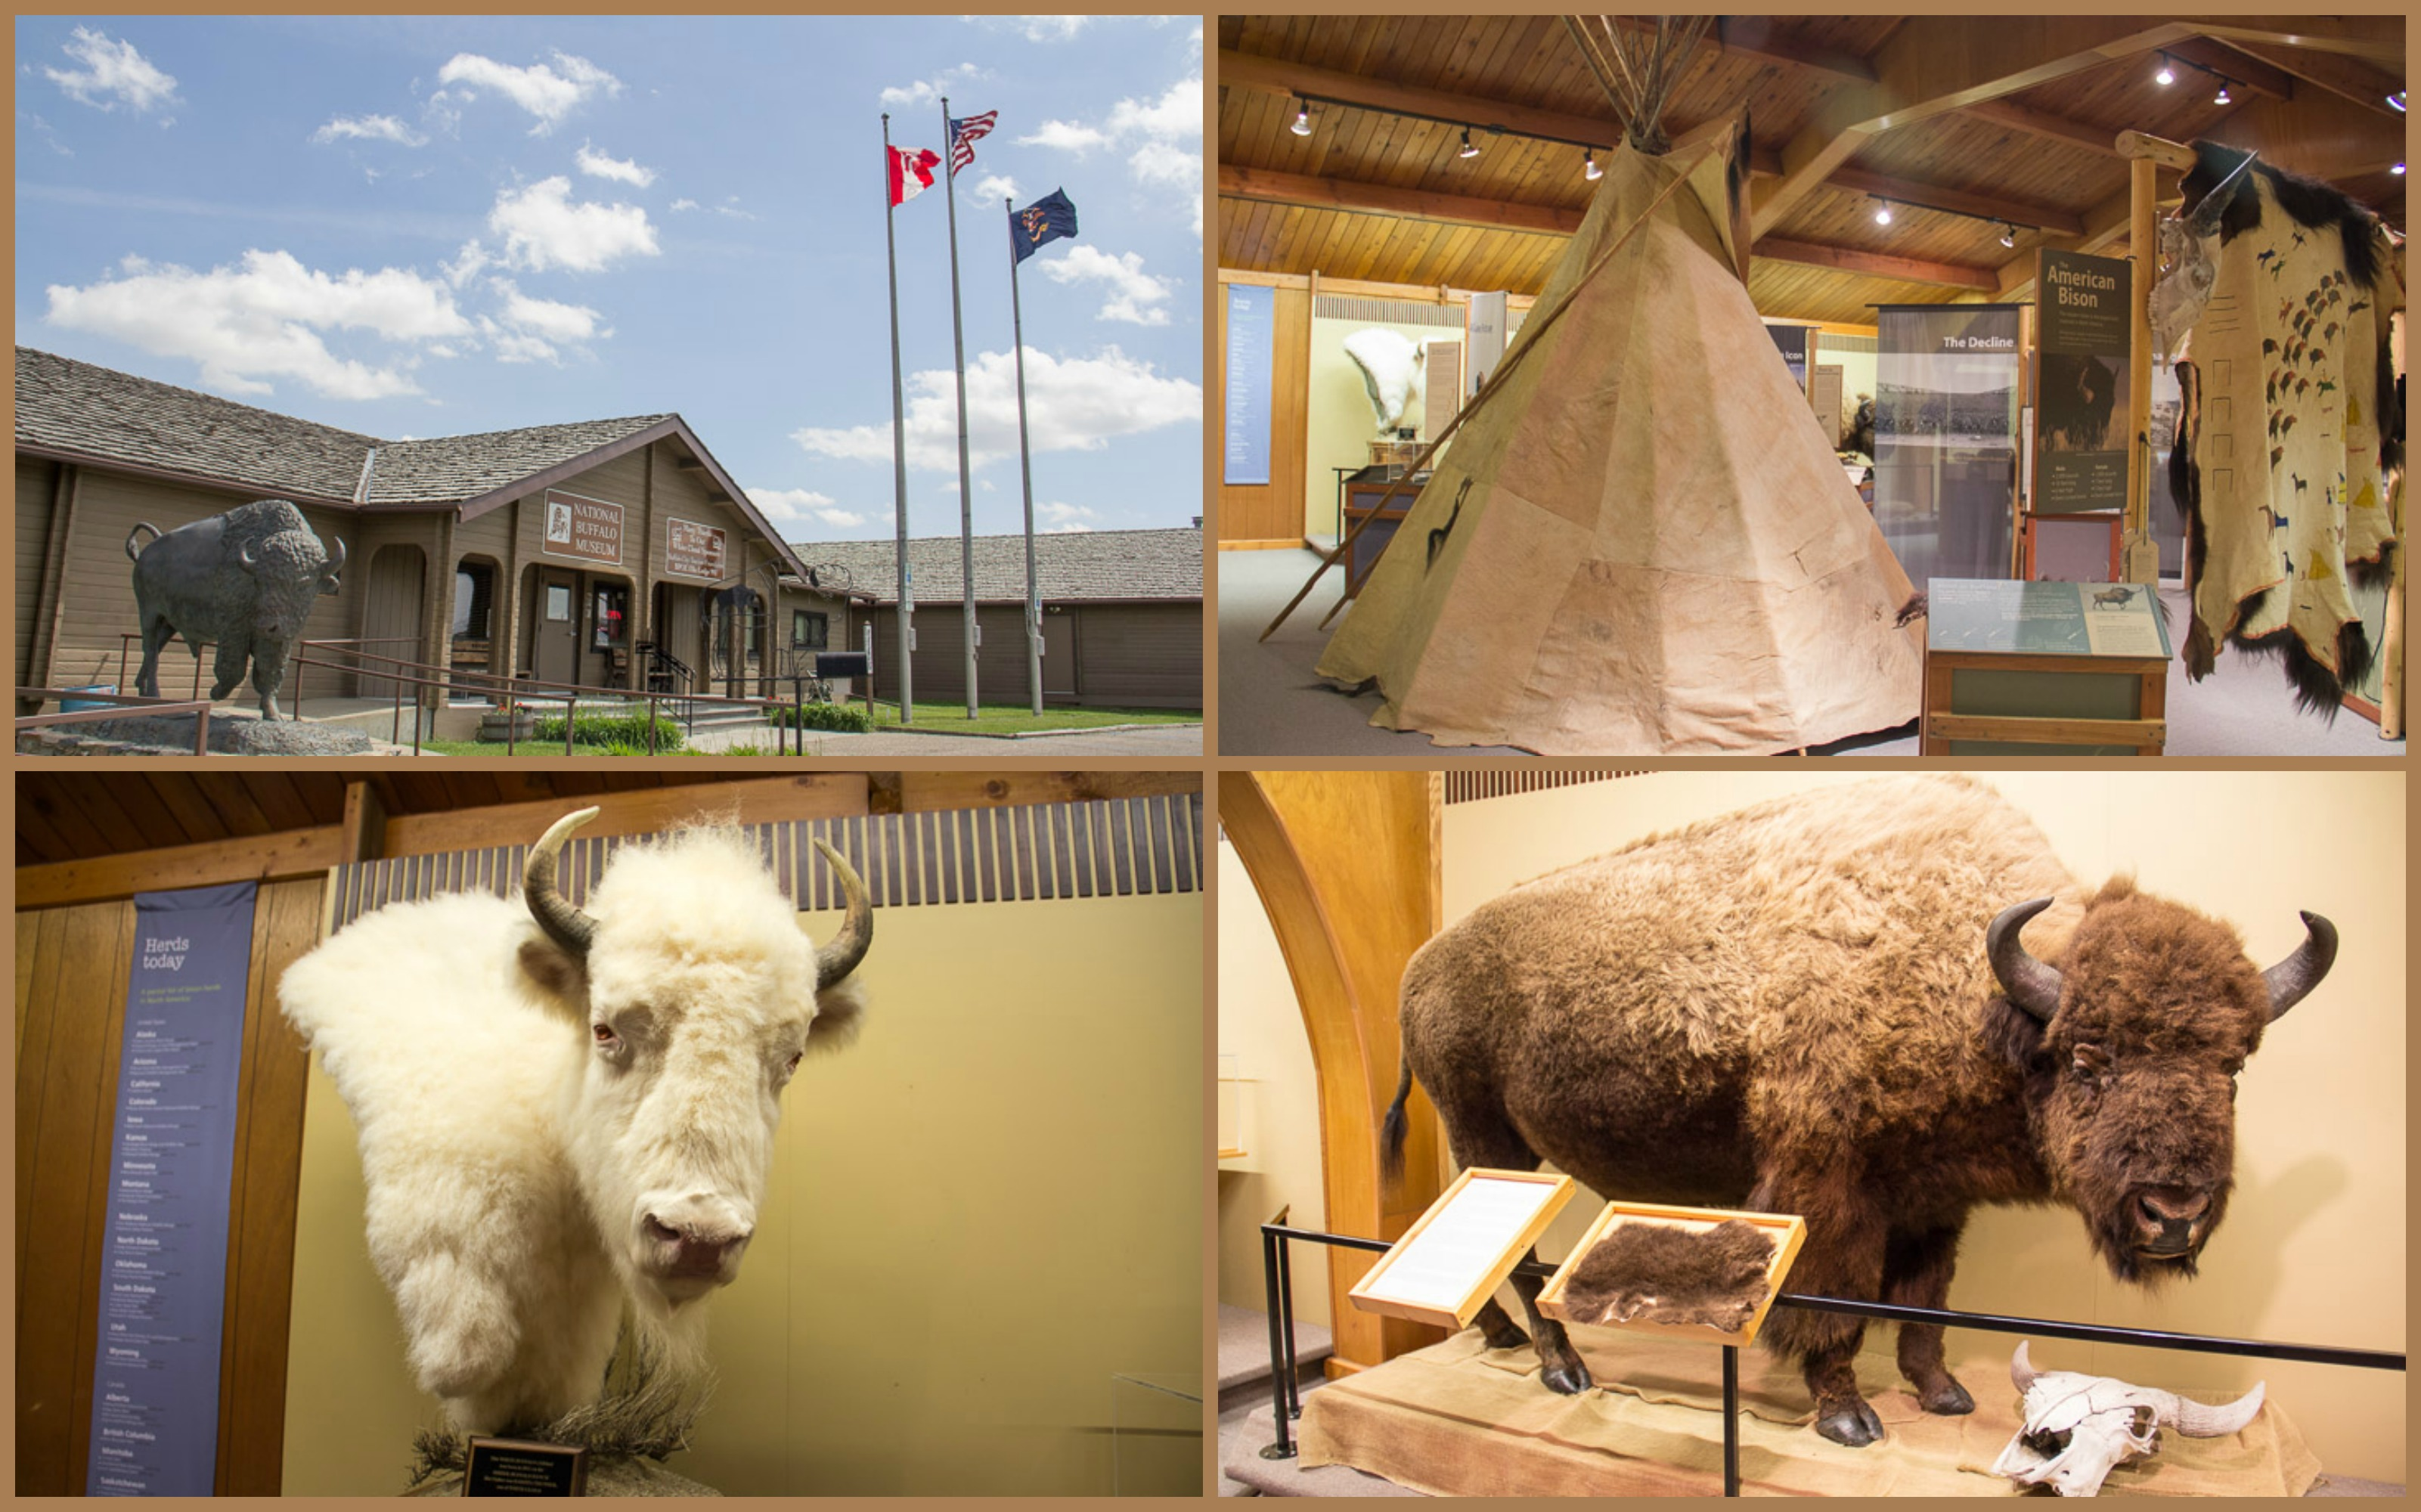 National Buffalo Museum, Jamestown, North Dakota